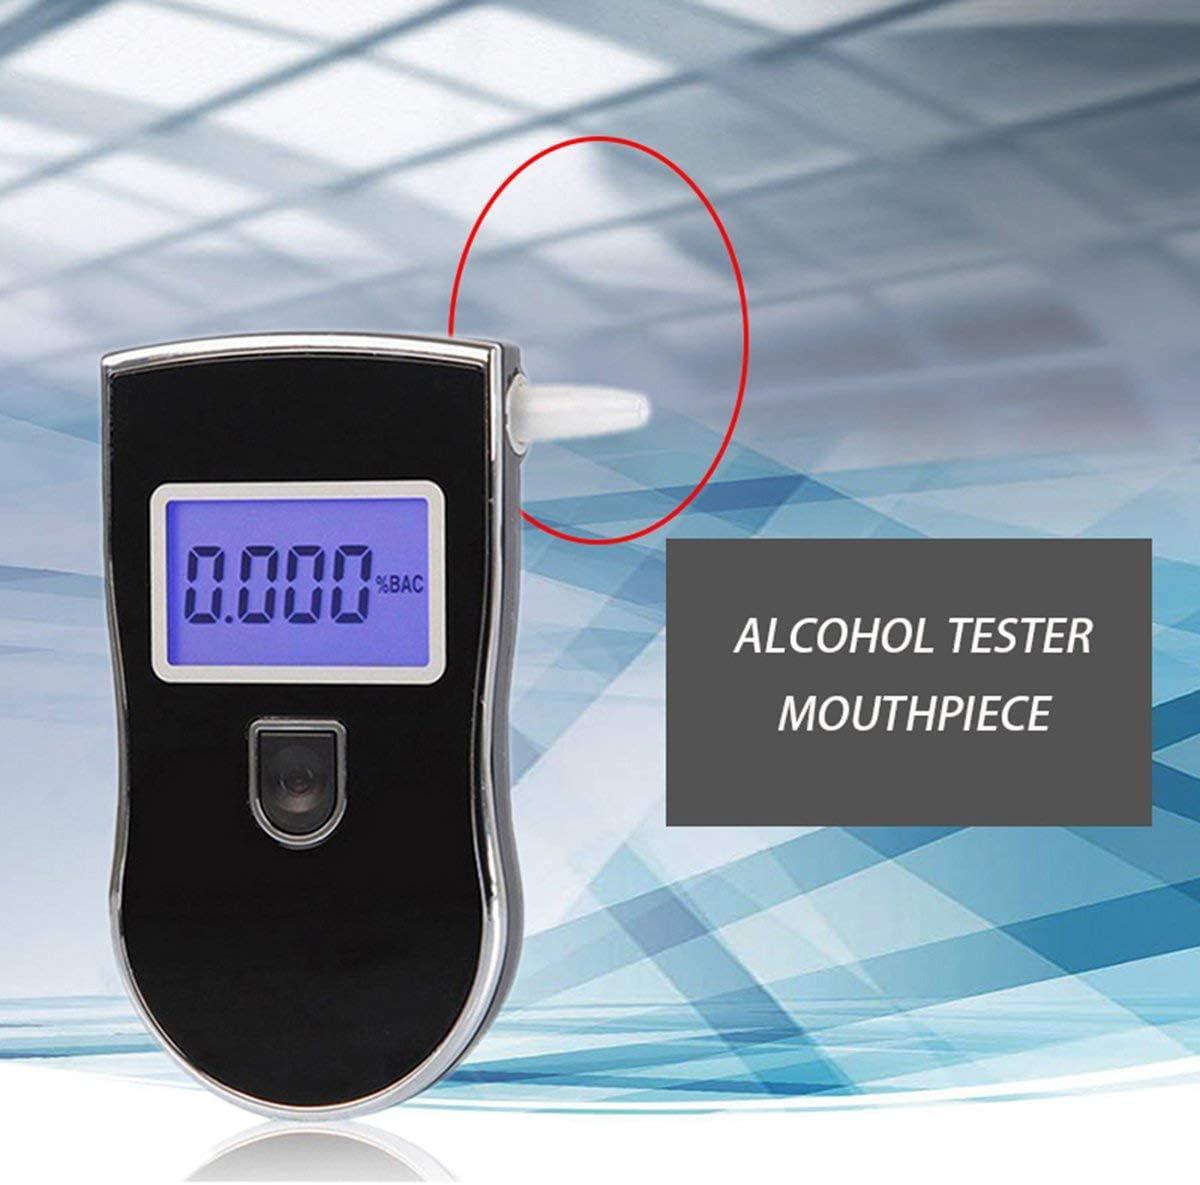 Greatangle Haltbare Mundst/ücke f/ür Atemalkohol-Tester Alkoholtester Digitale Mundst/ücke f/ür Alkoholtester